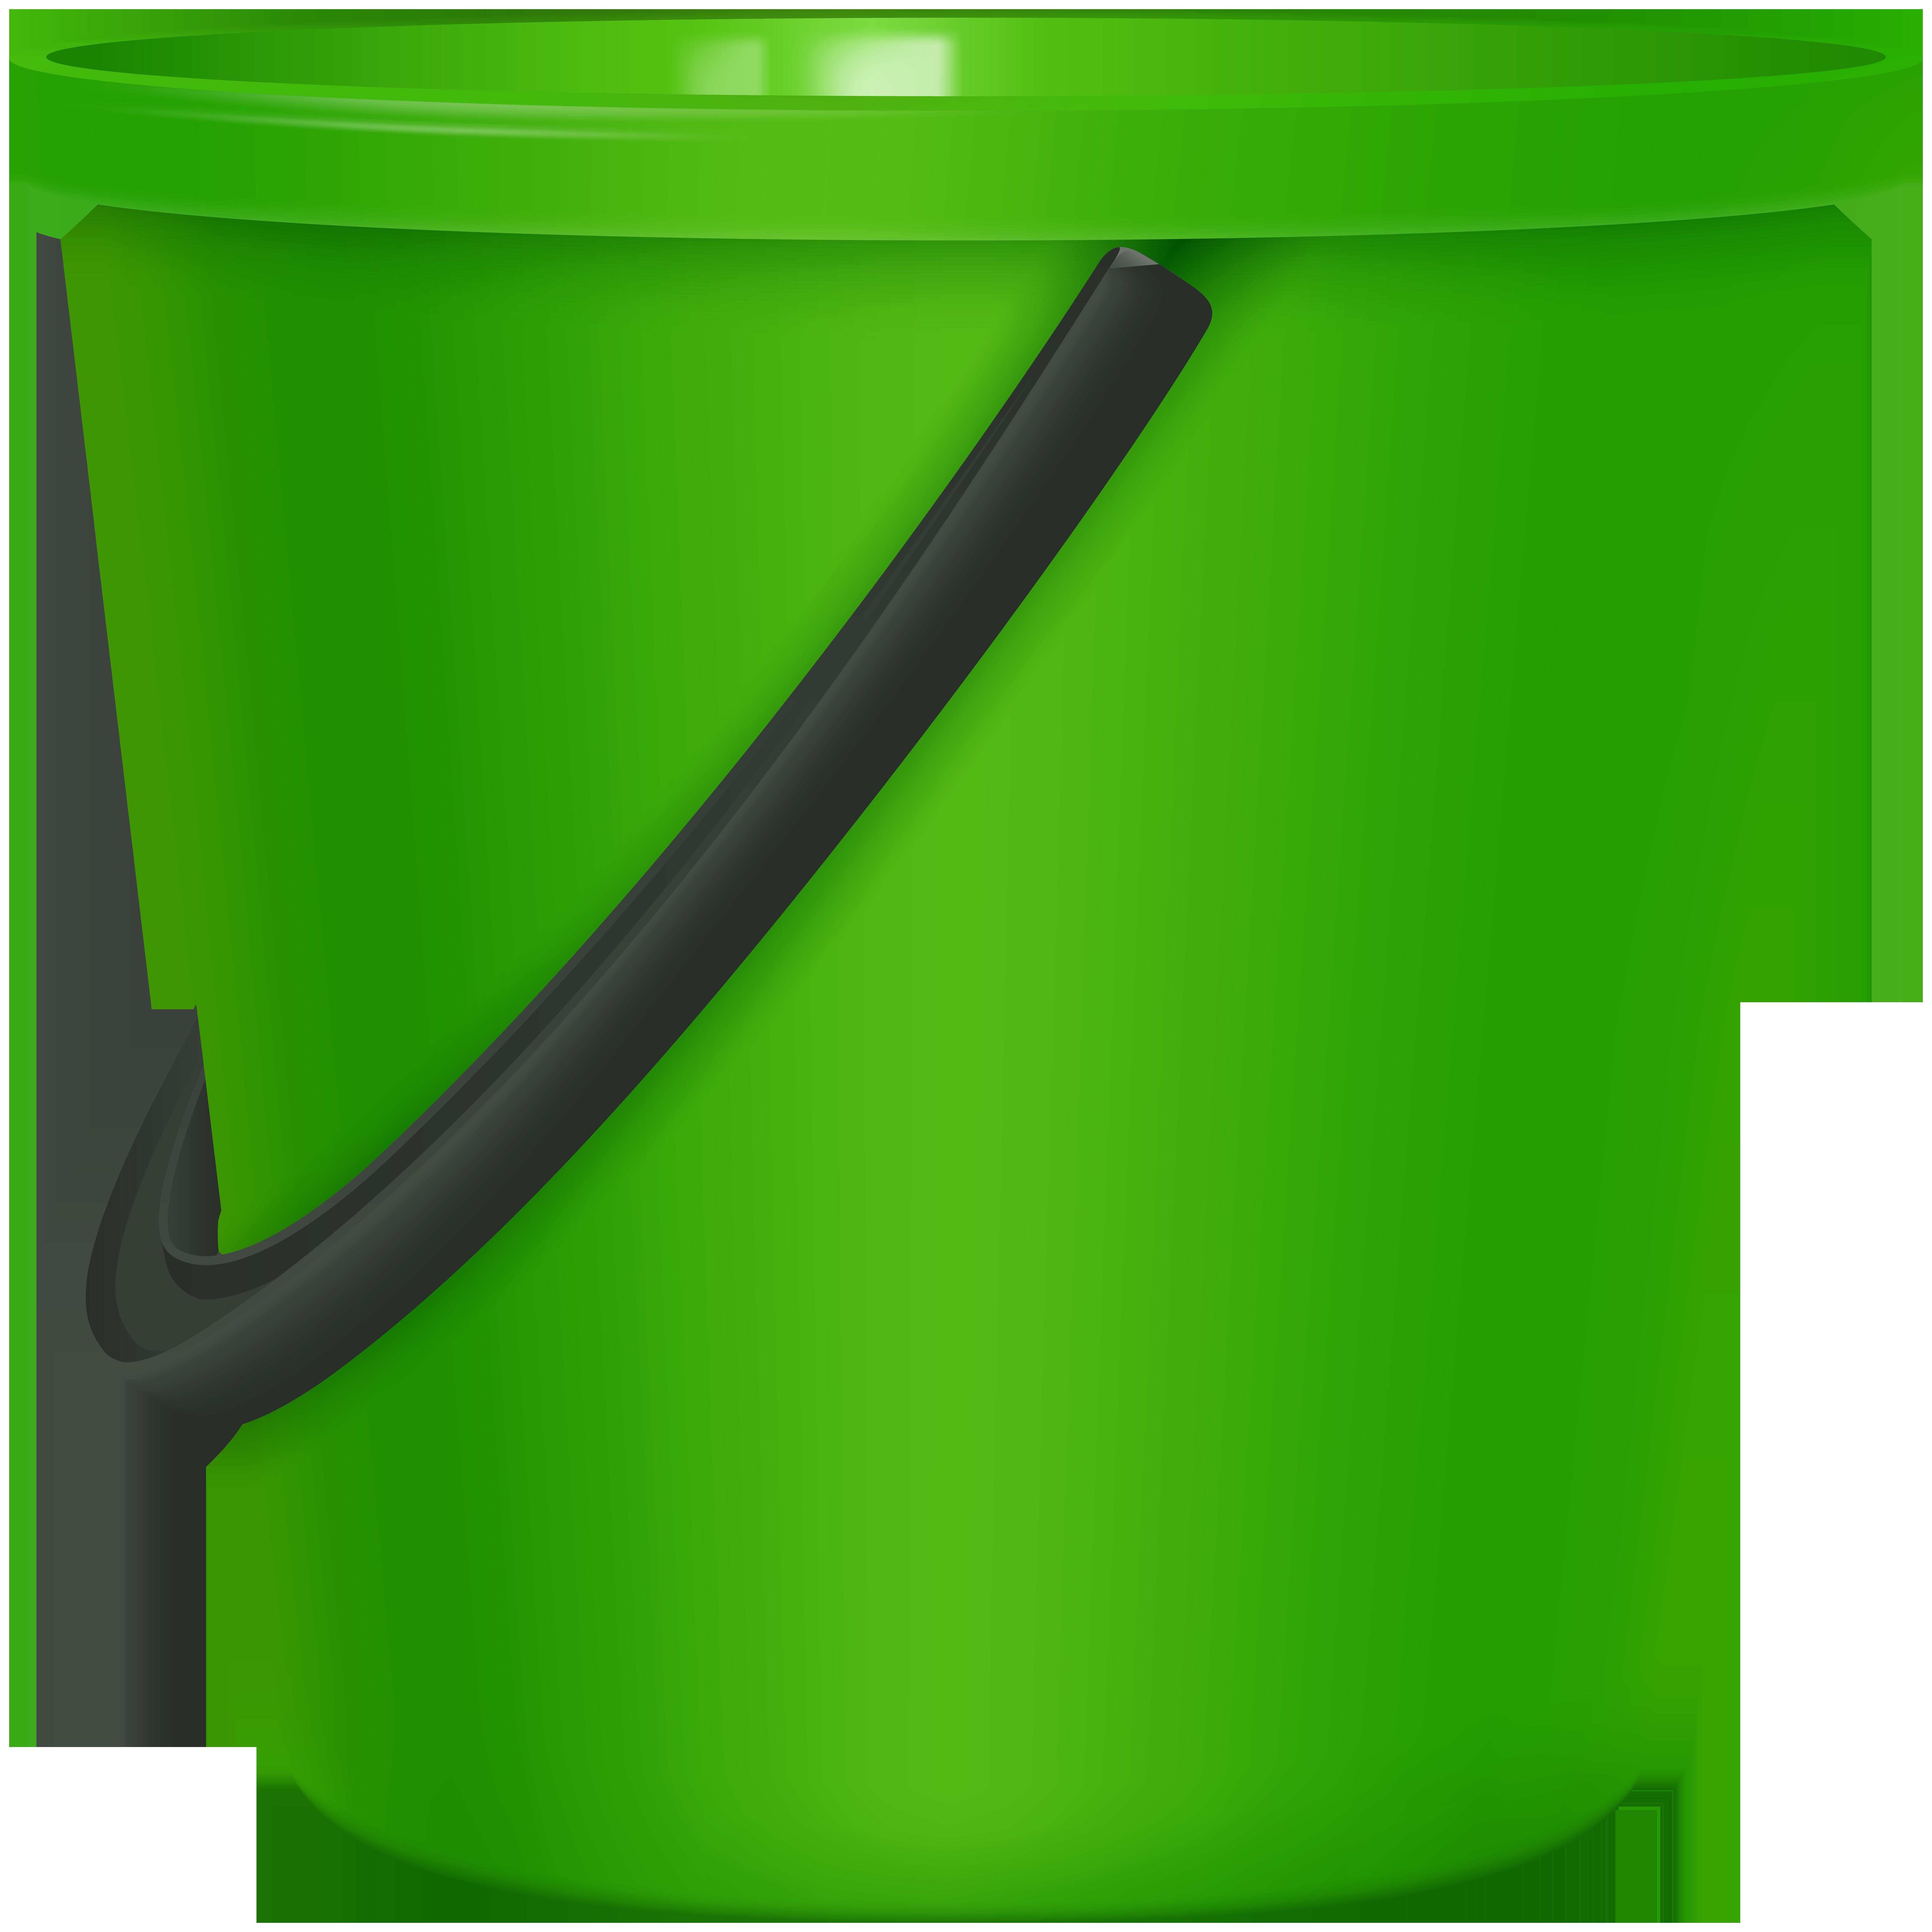 Bucket clipart. Green png clip art